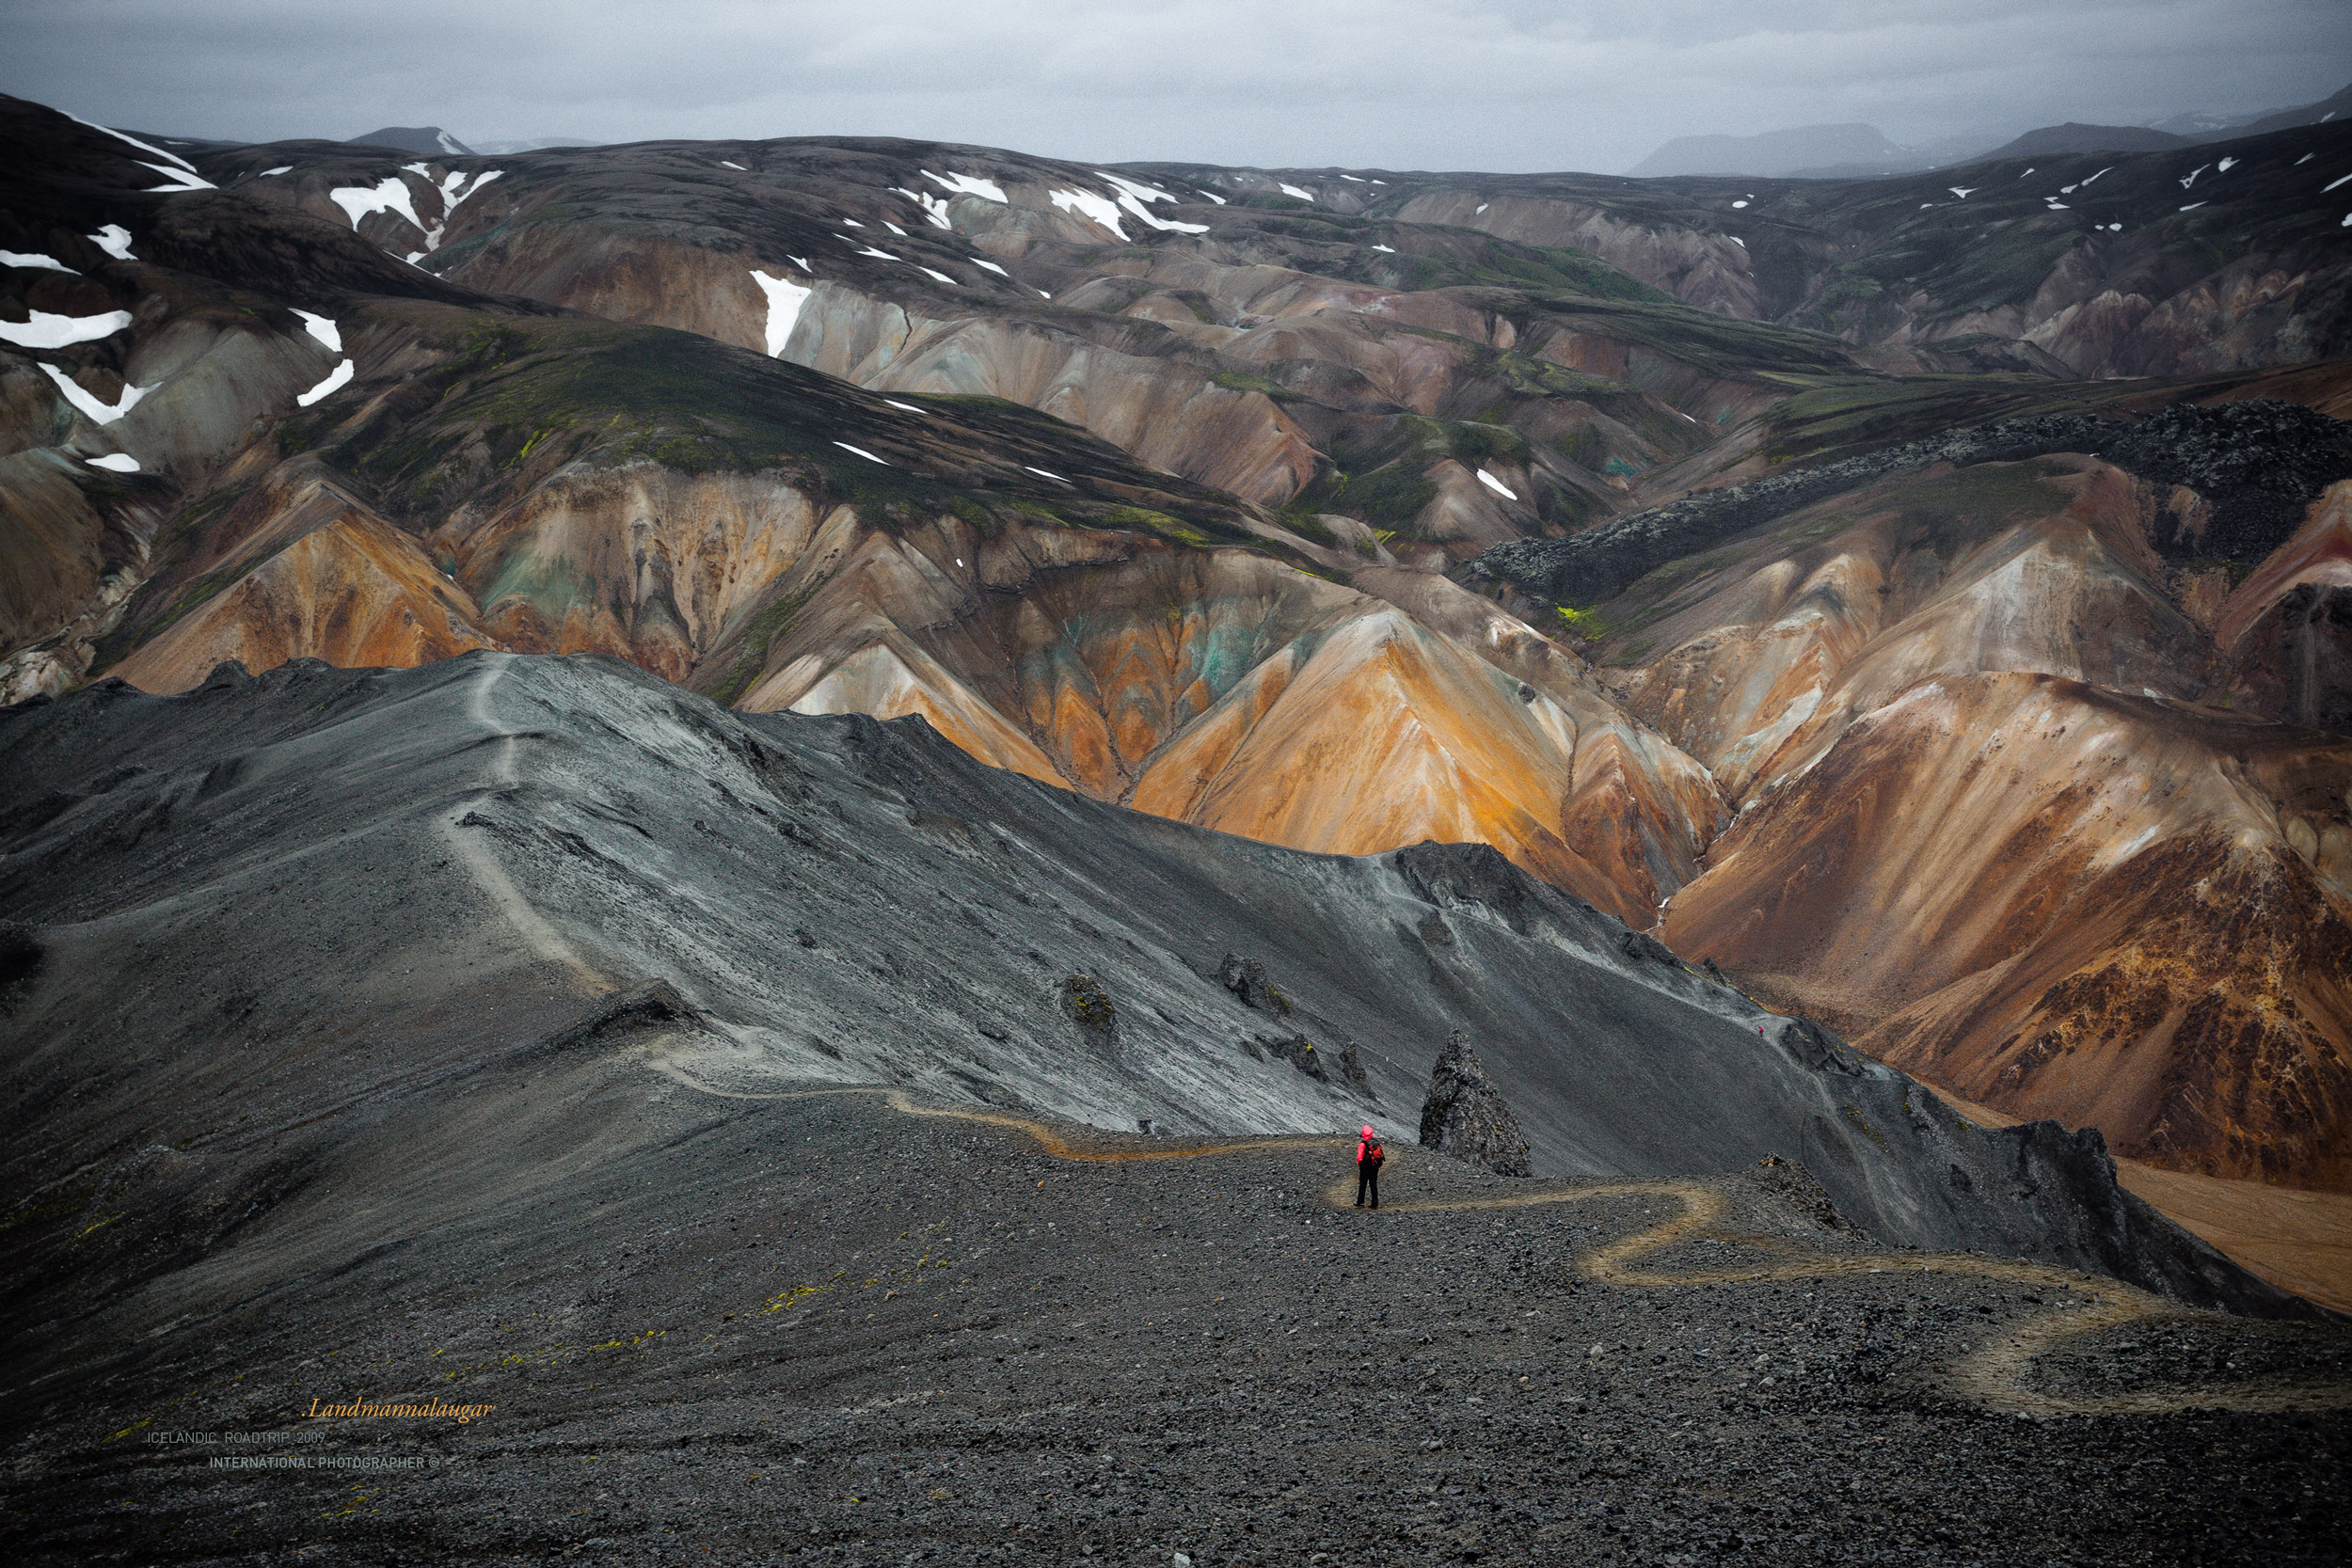 Montagne du Landmannalaugar en Islande